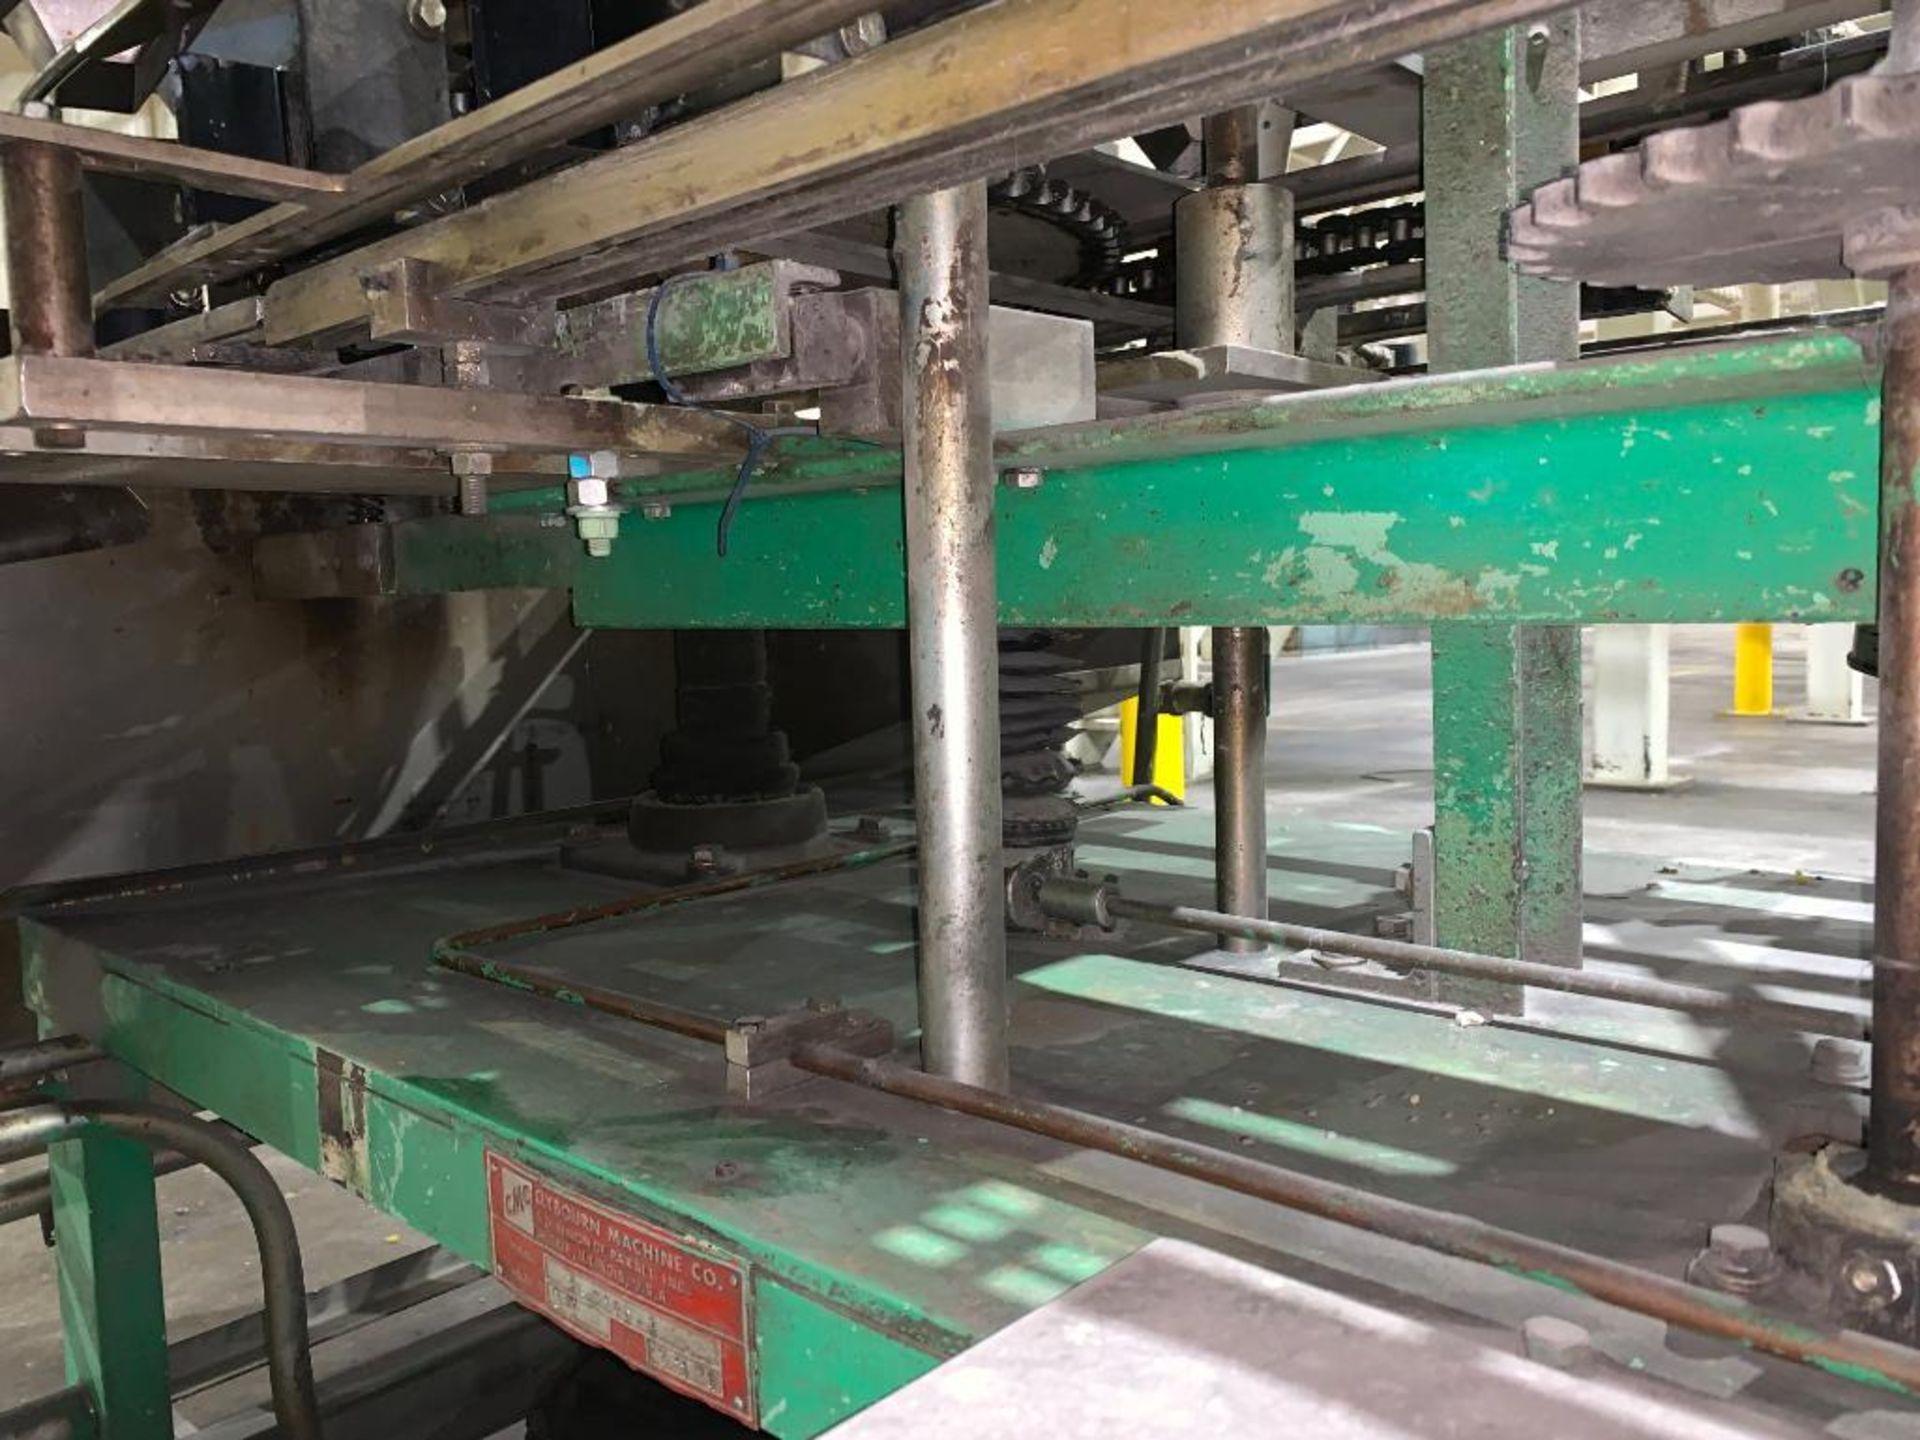 1978 Clybourn carton erecting filling closing machine - Image 15 of 68